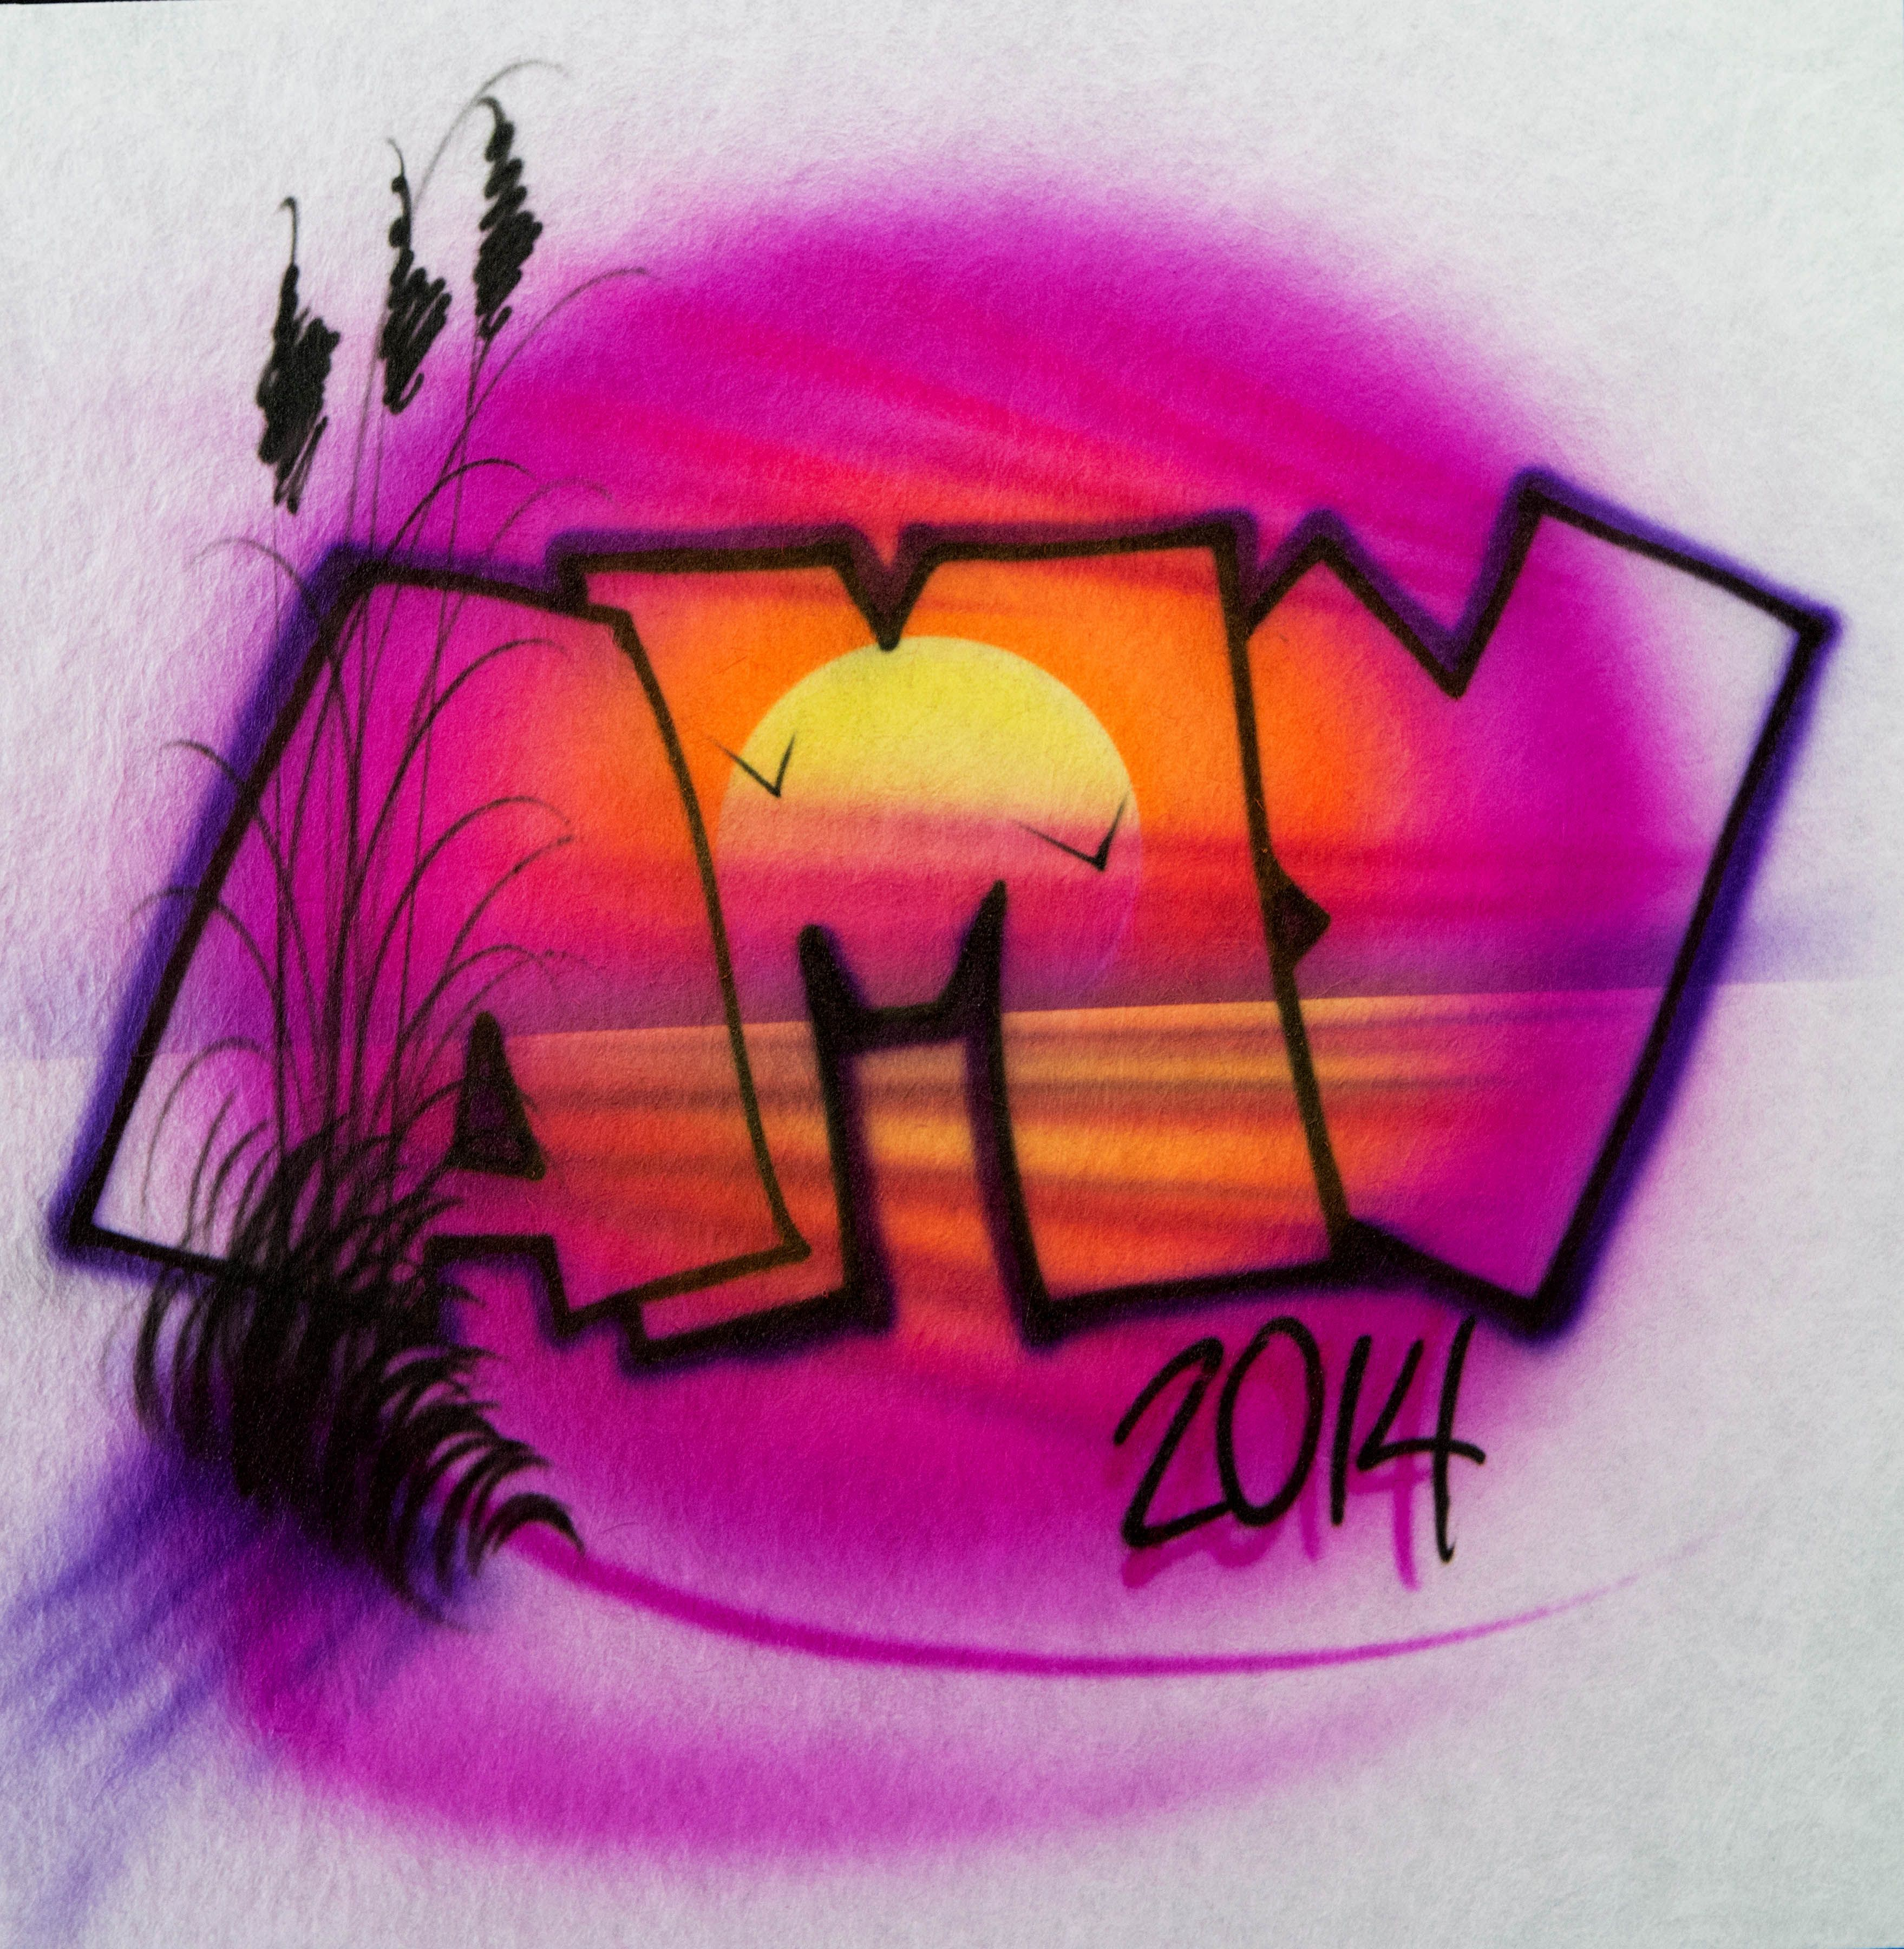 Art Top T-shirt Airbrush Pro Gary Worthington. Hot-selling